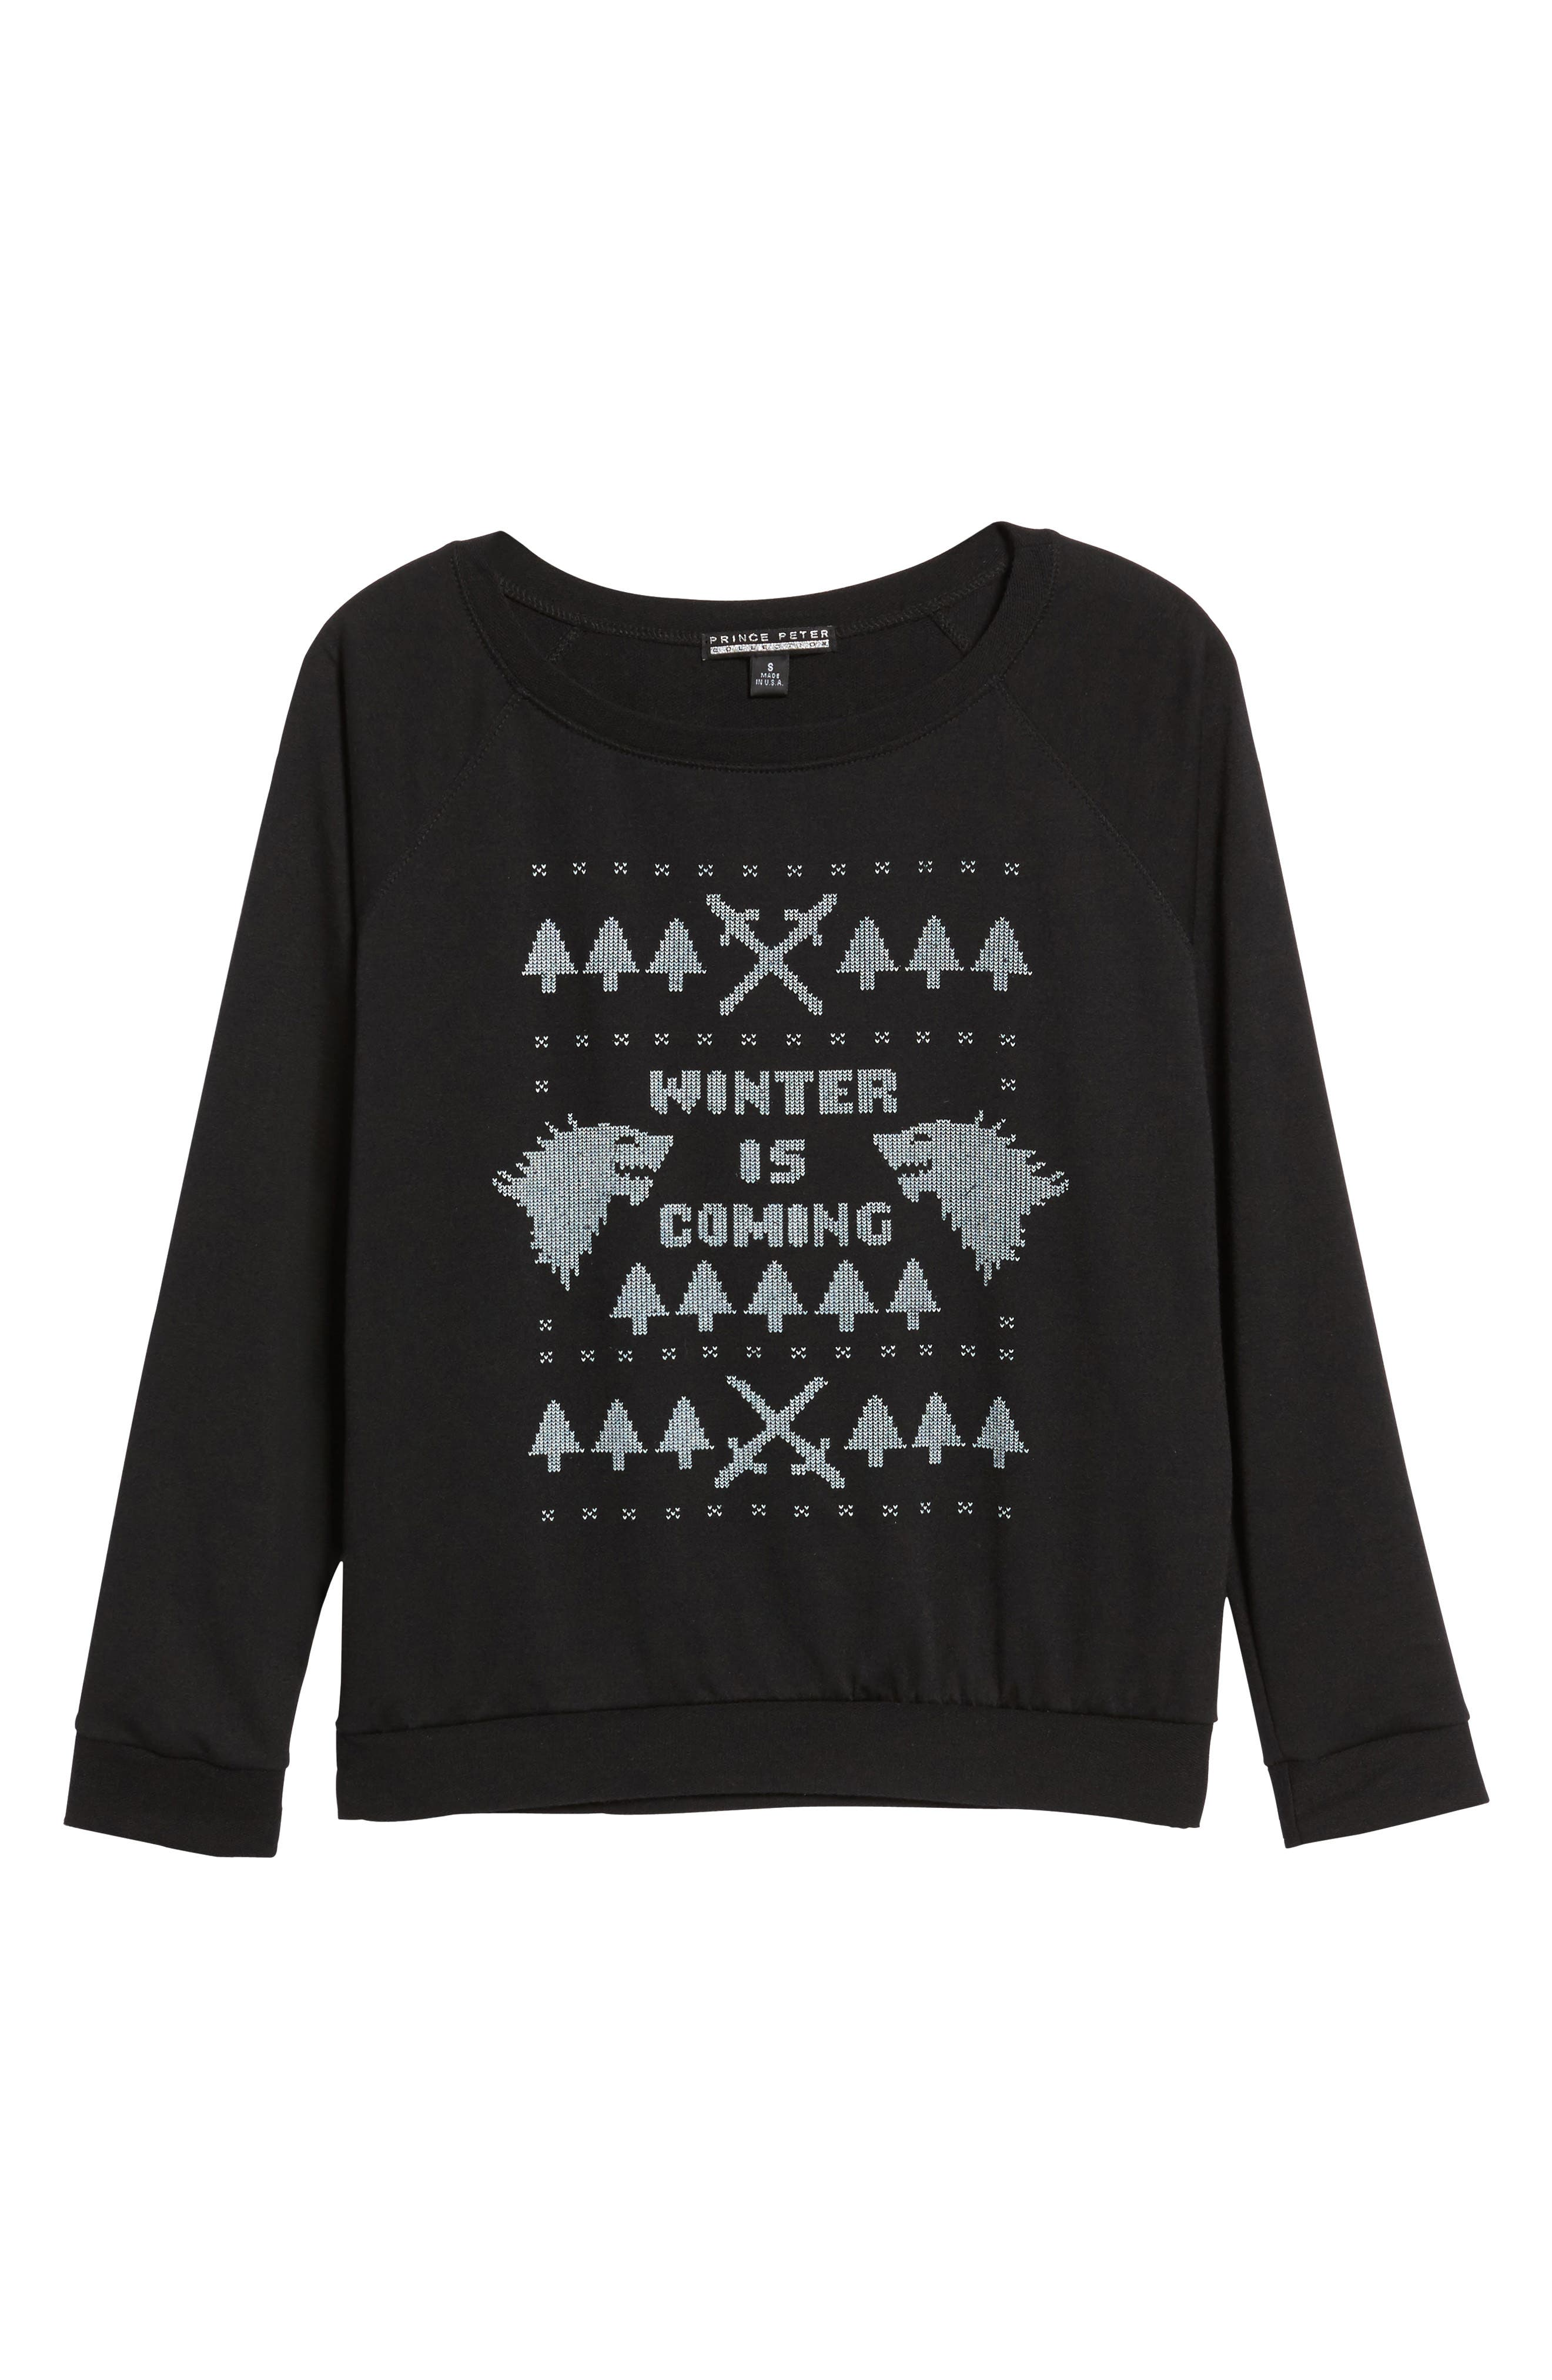 Winter Is Coming Sweatshirt,                             Alternate thumbnail 6, color,                             Black